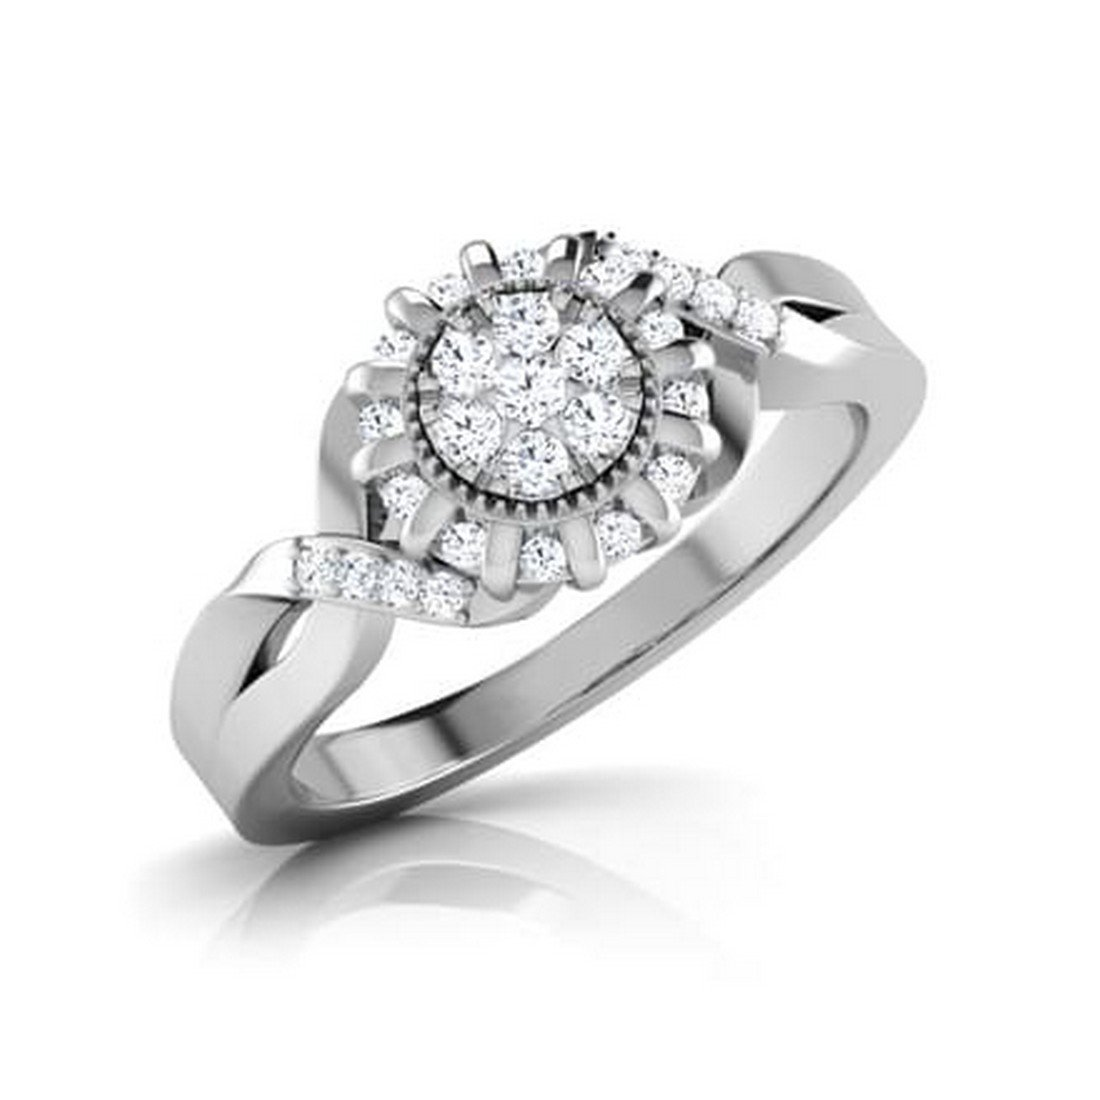 14K White Gold (HallMarked), 0.33 cttw Round-Cut Diamond (IJ | SI ) Diamond Engagement Wedding Ring Size - 7